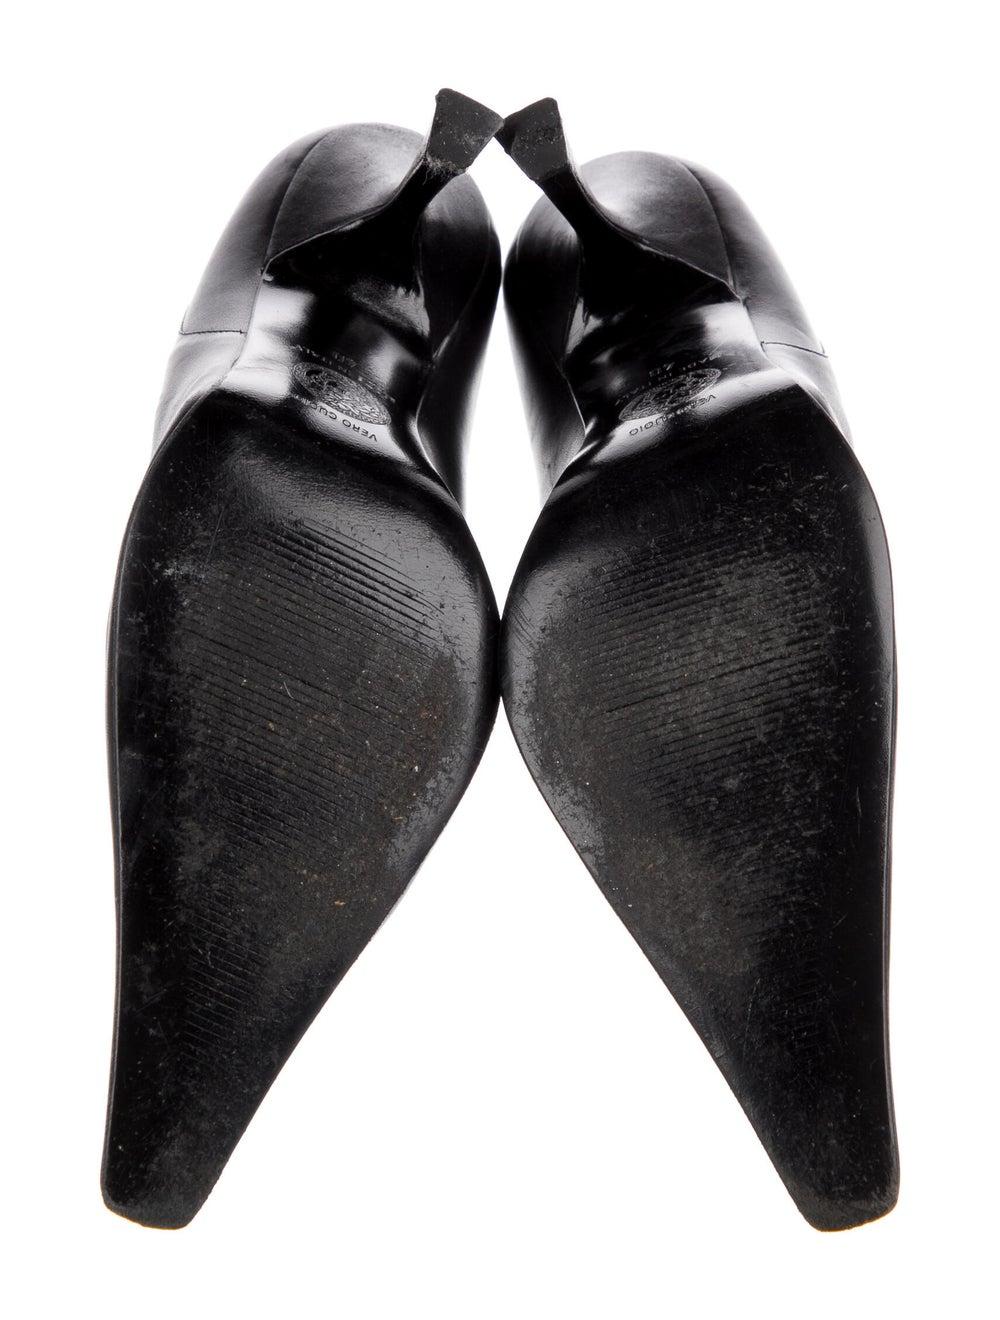 Gianni Versace Leather Pumps Black - image 5